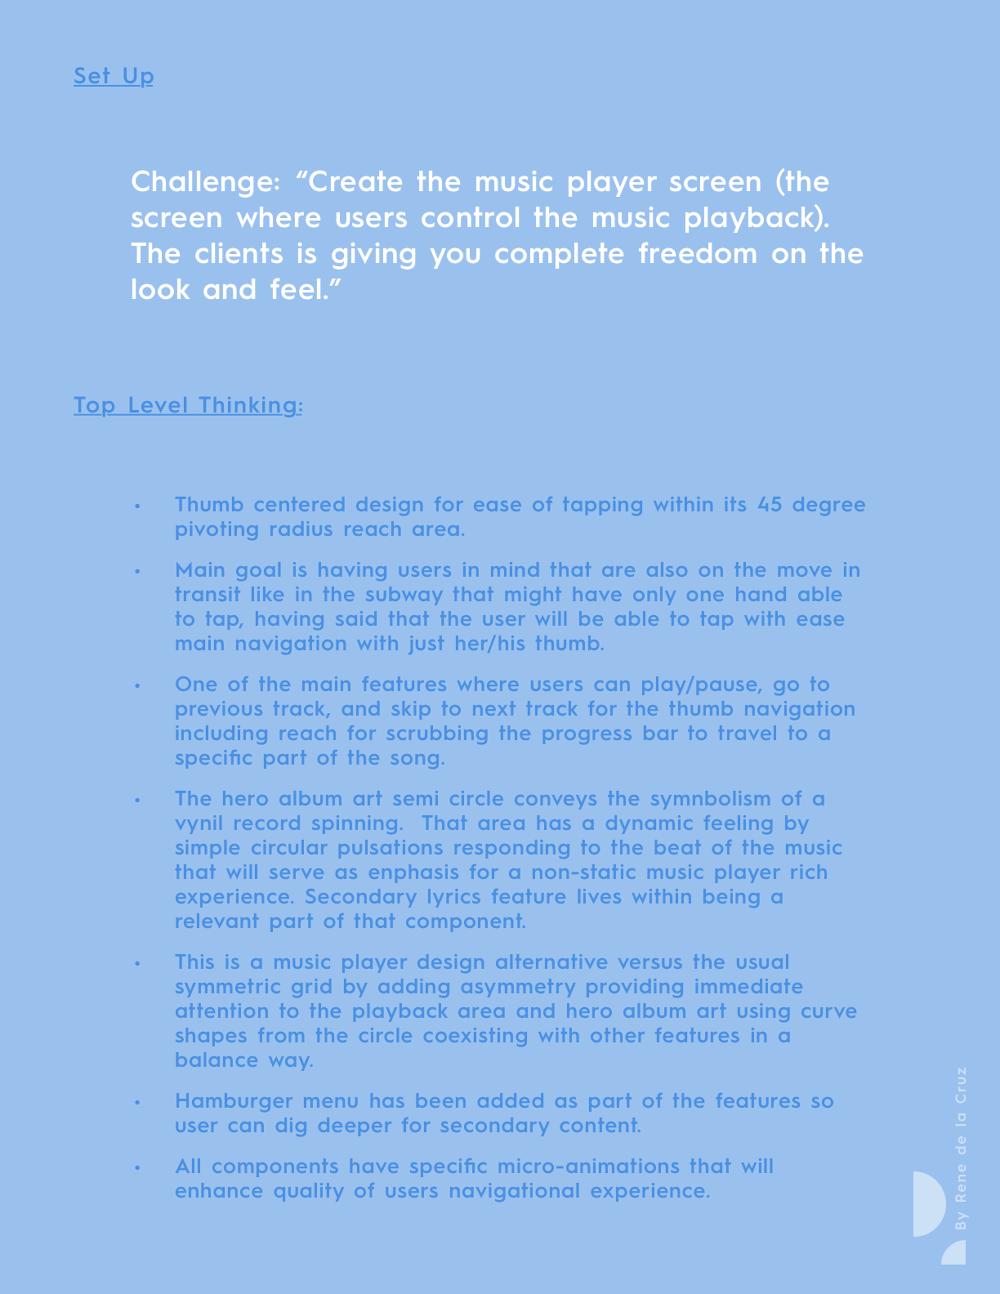 u0026quot music player screen u0026quot  - five hour design exercise